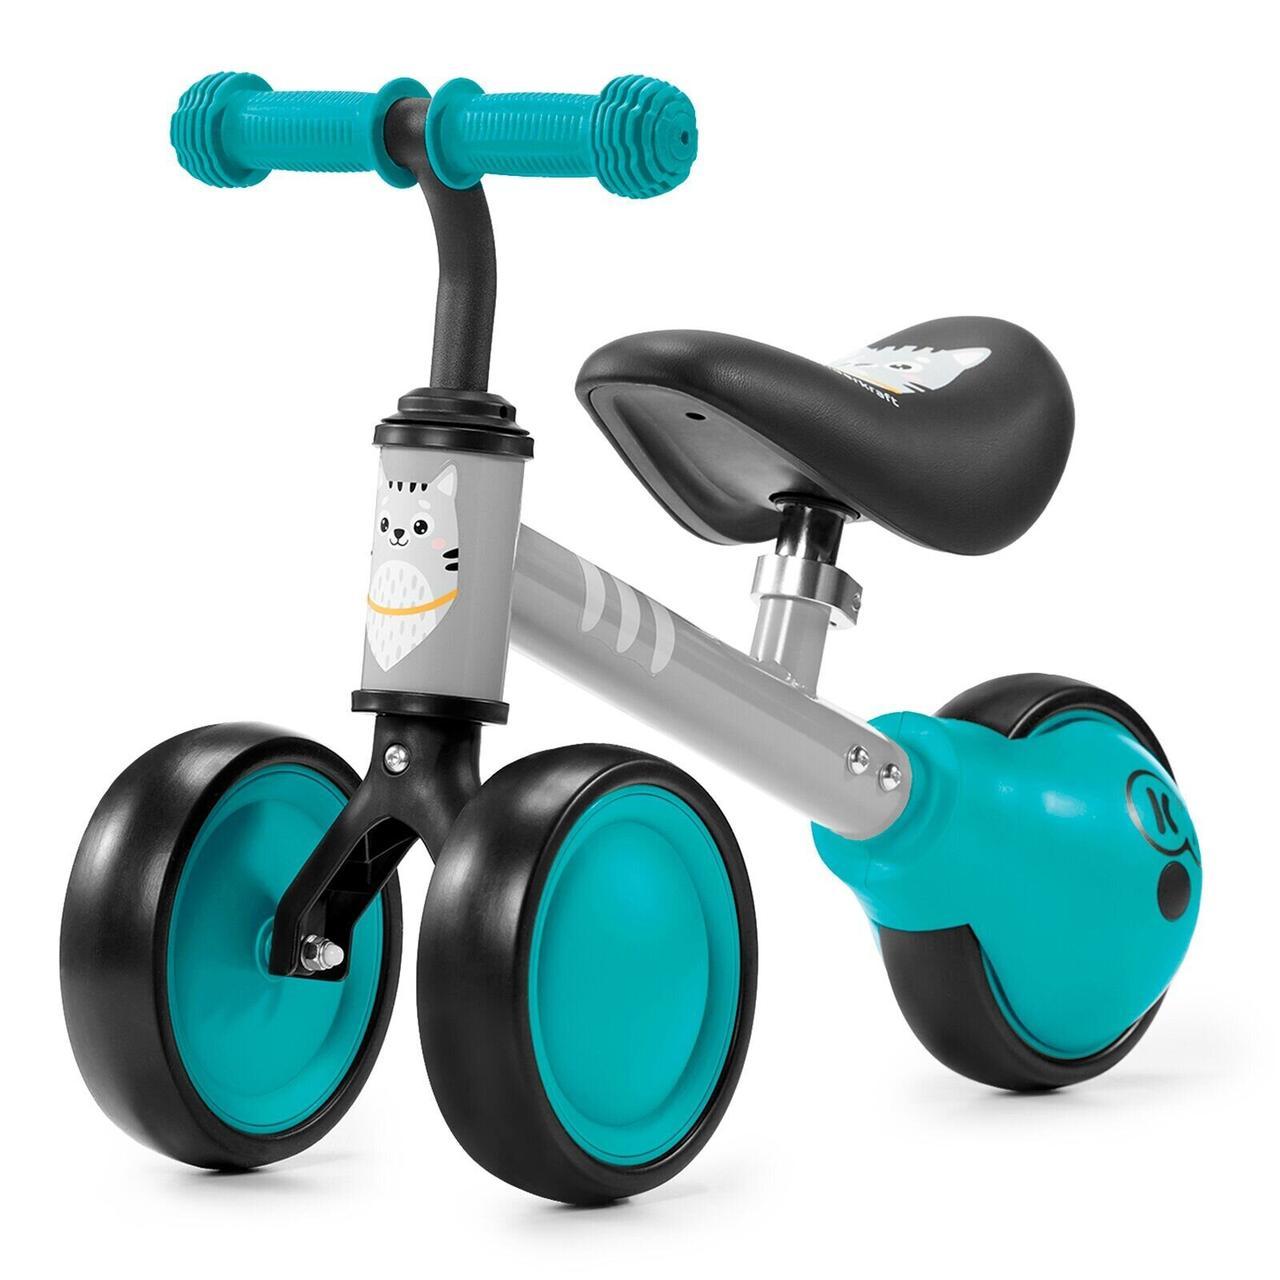 Каталка-беговел Kinderkraft Cutie Turquoise (KKRCUTITRQ0000)